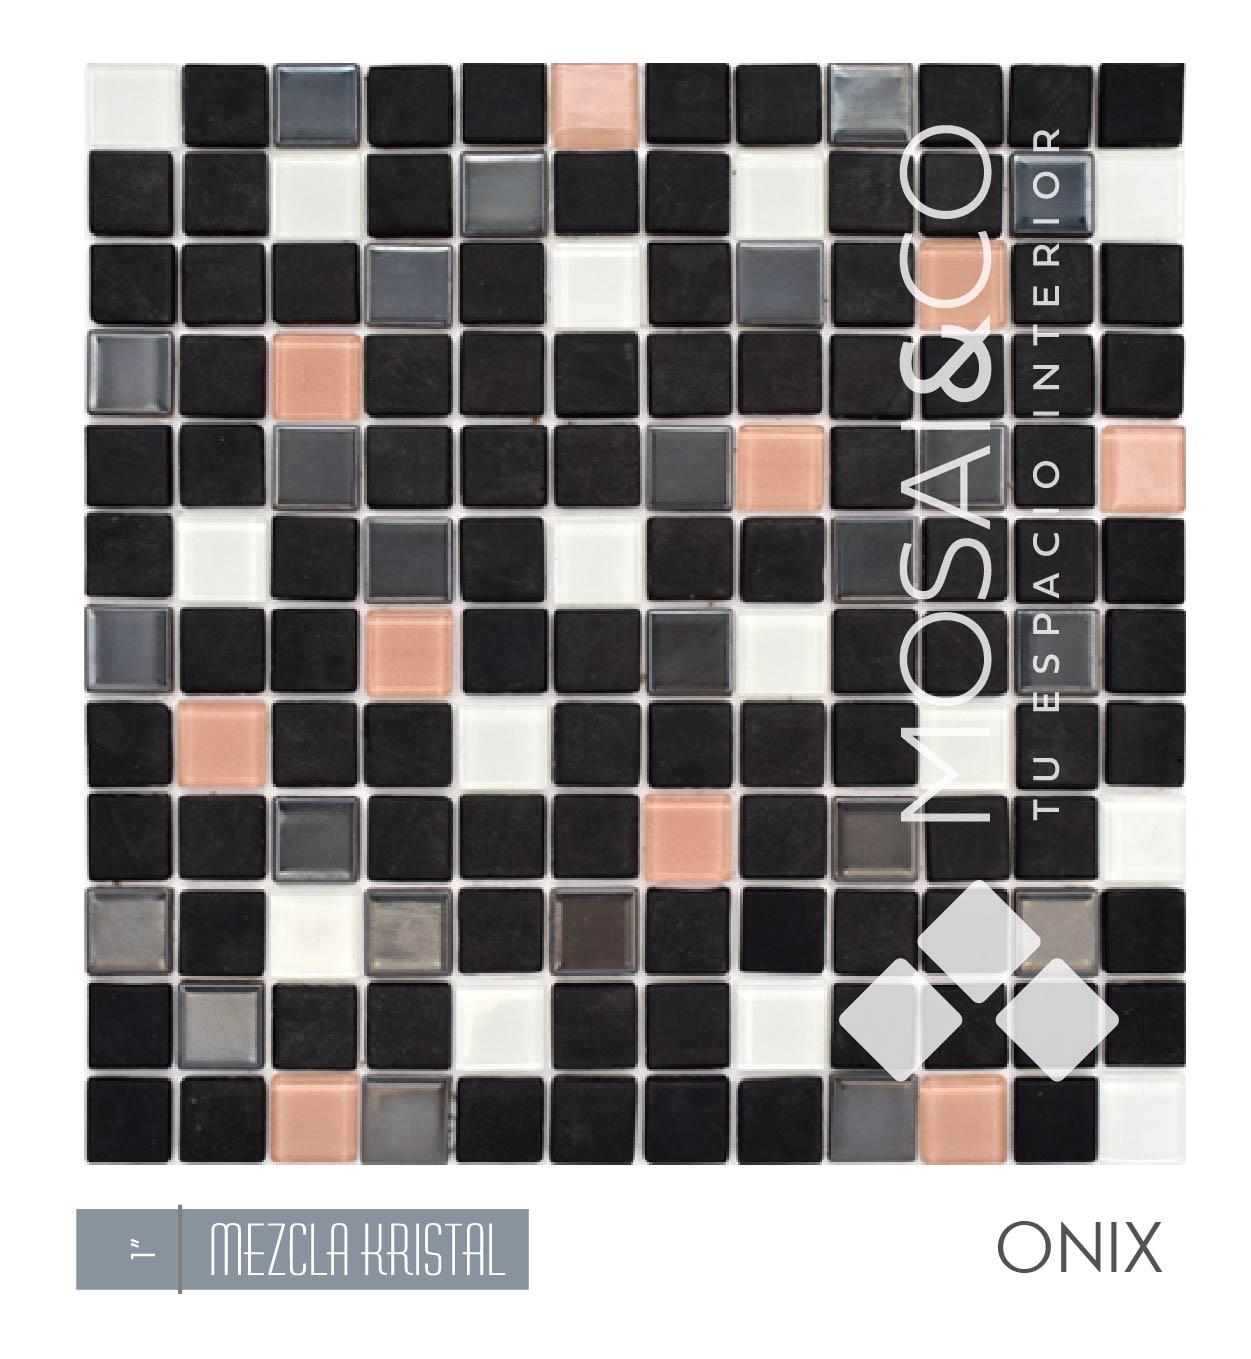 mosaico-linea-mezcla-kristal-mosaiandco-1-onix